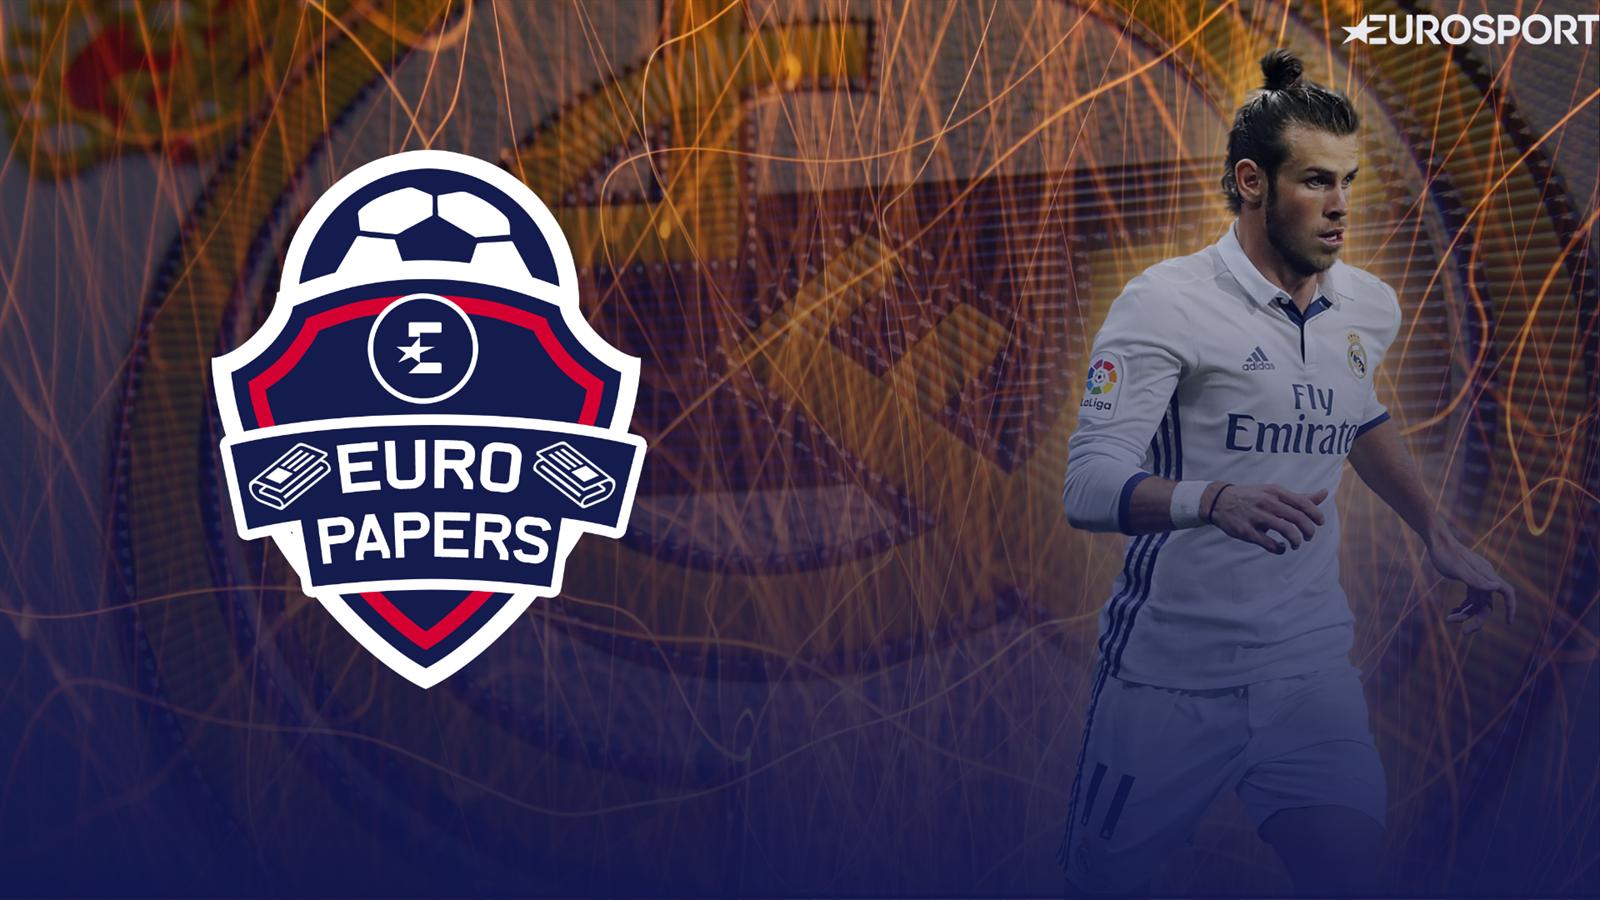 093857998 VIDEO - Euro Papers - Gareth Bale to lead nine-man Real Madrid exodus